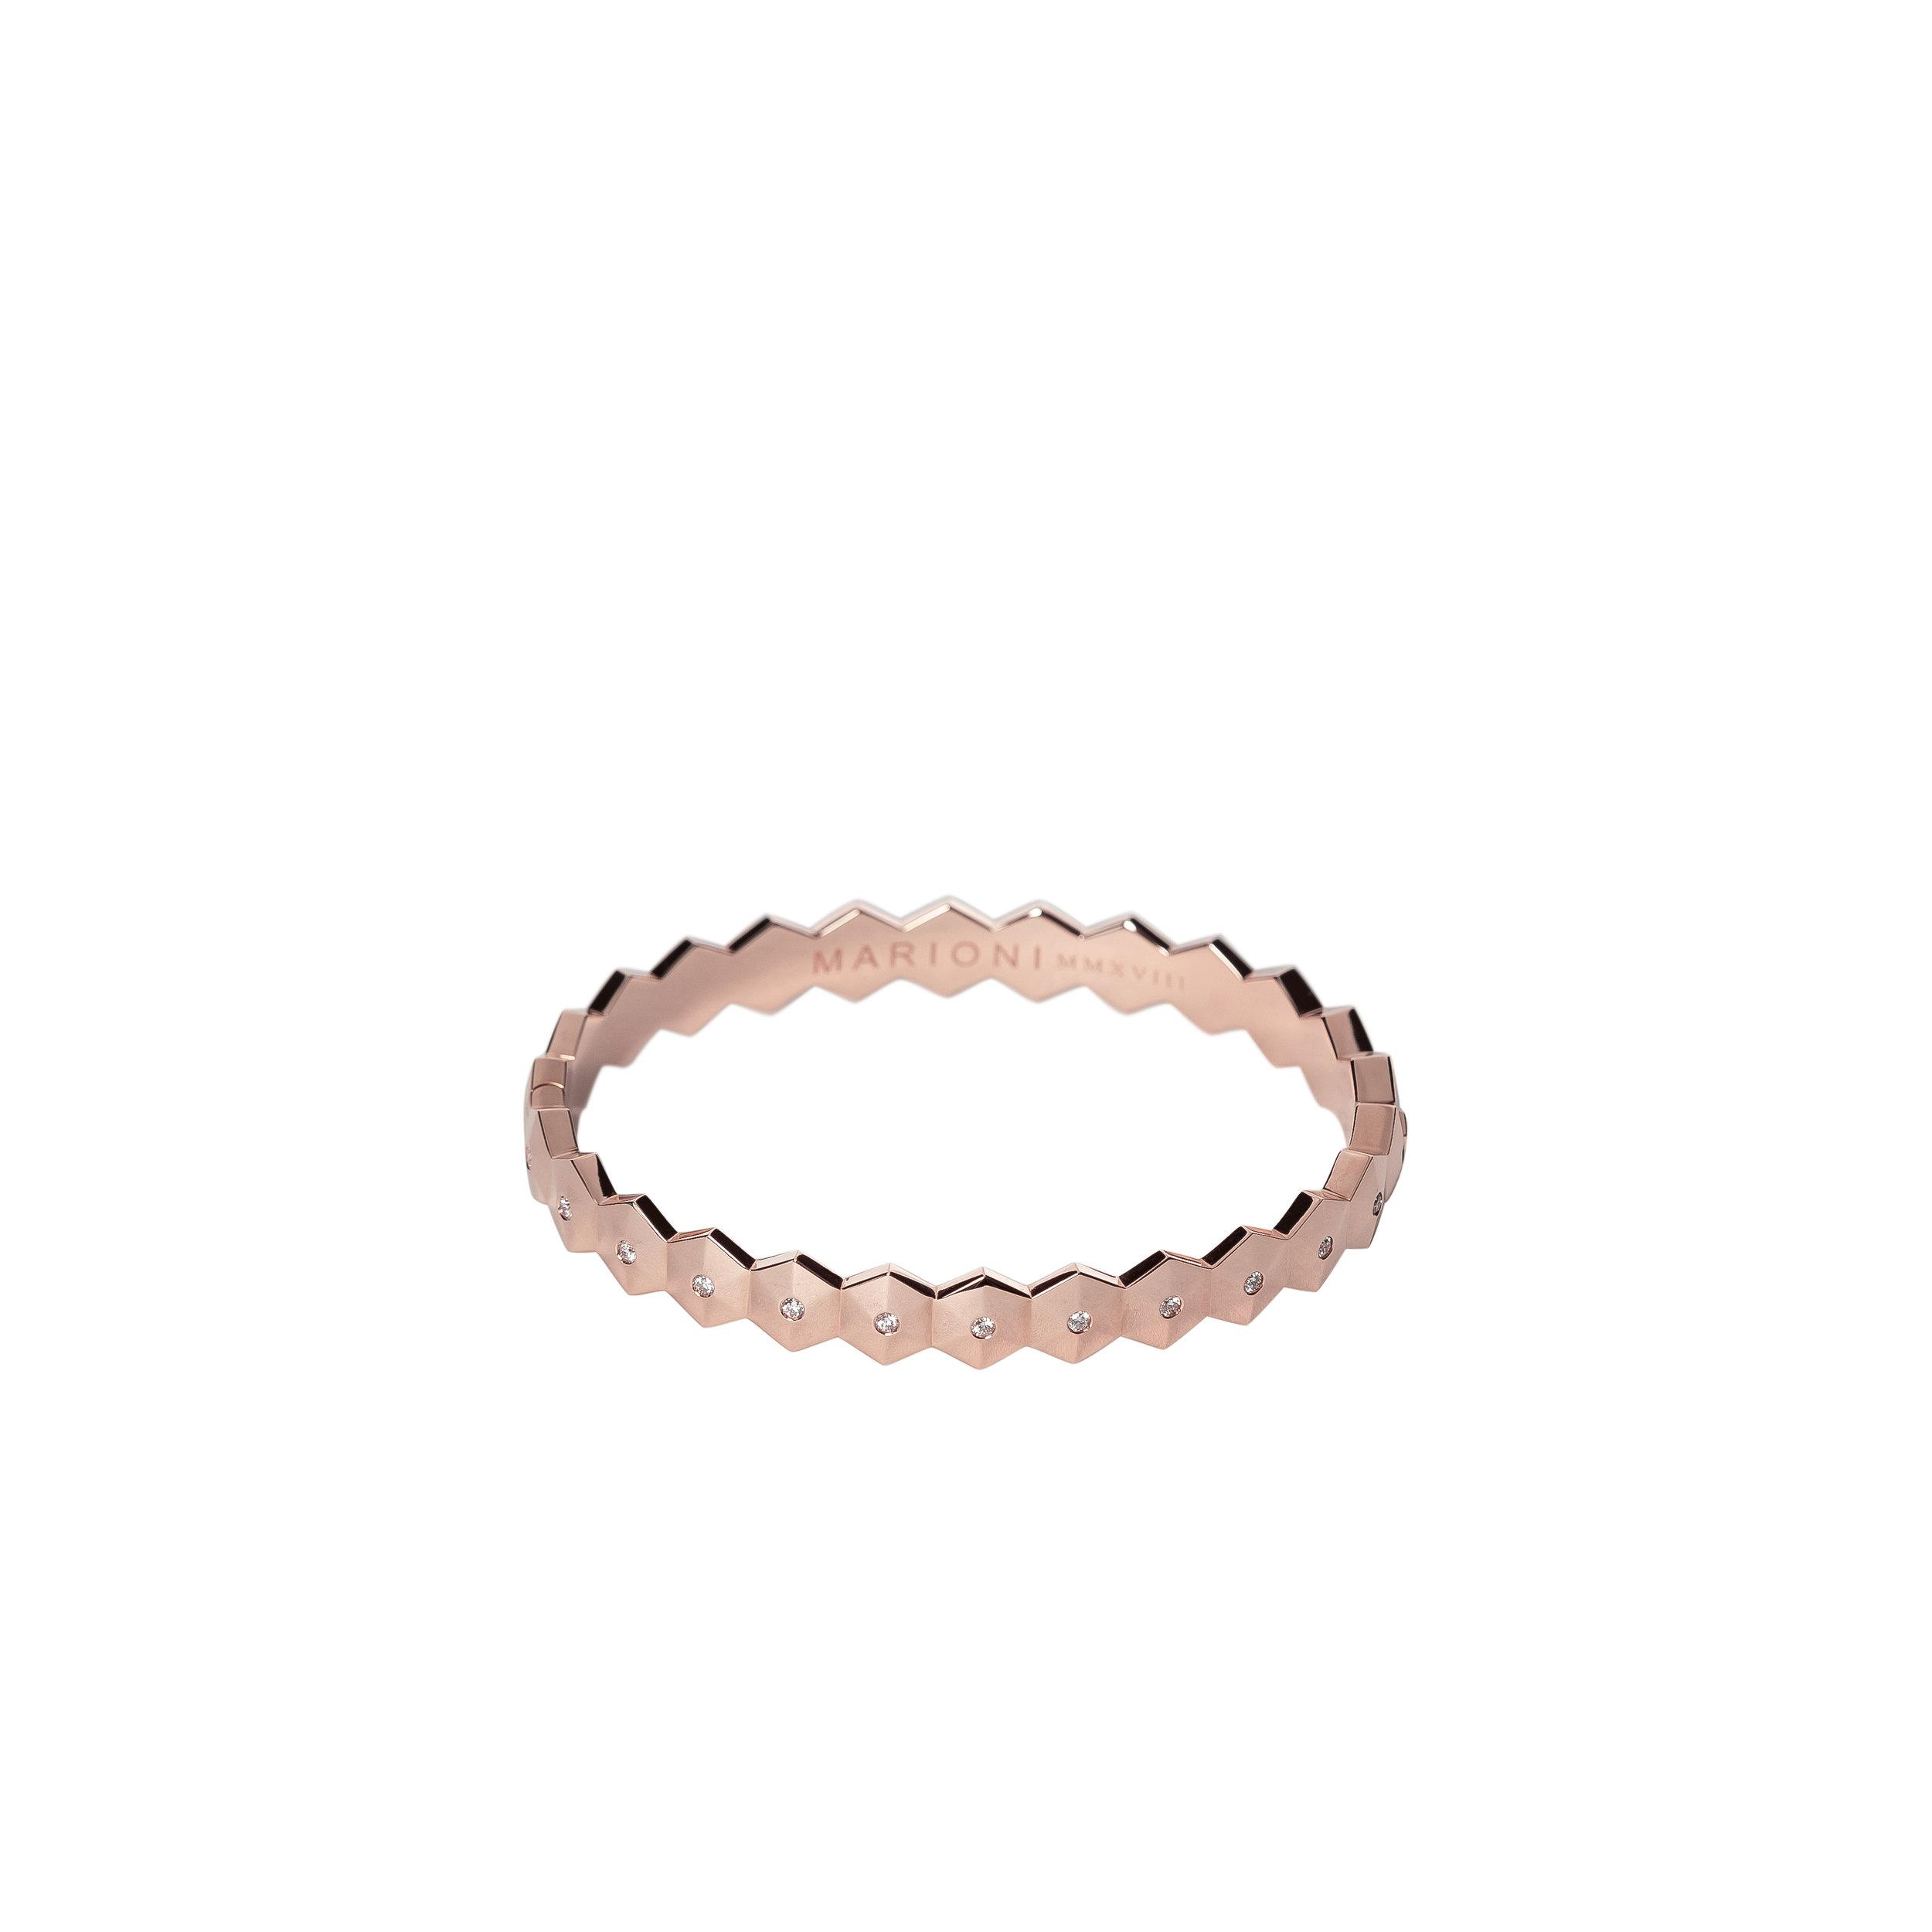 ABE1_Marioni_Jewelry_Studio_Products_ROSE_Bracelet.jpg